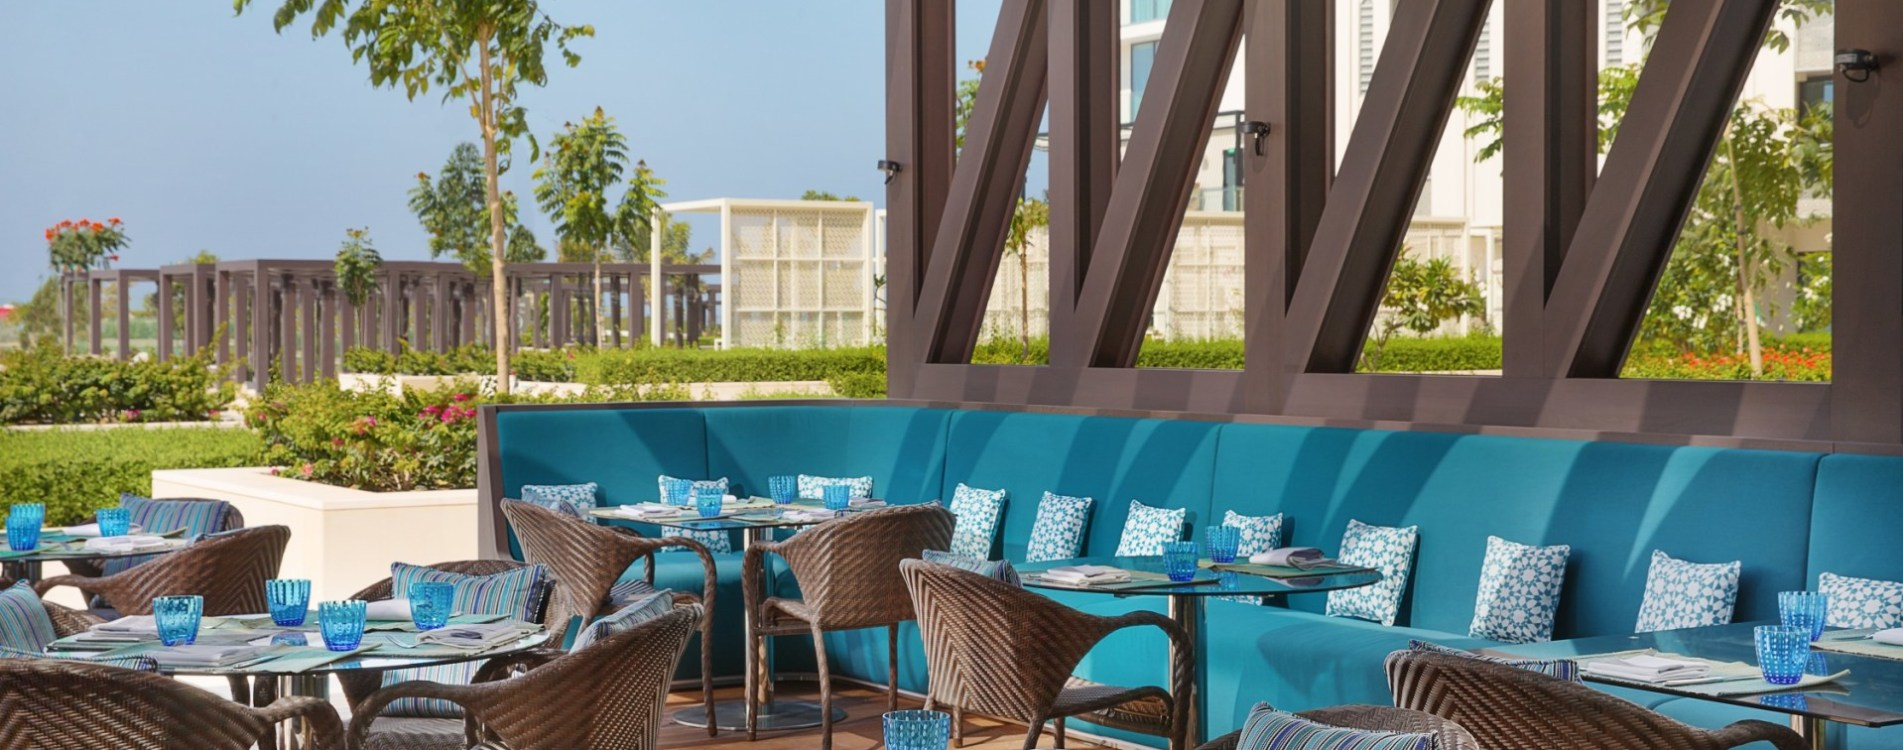 W-Muscat-Oman-Harvest-Outdoor-Restaurant-Terrasse.jpg